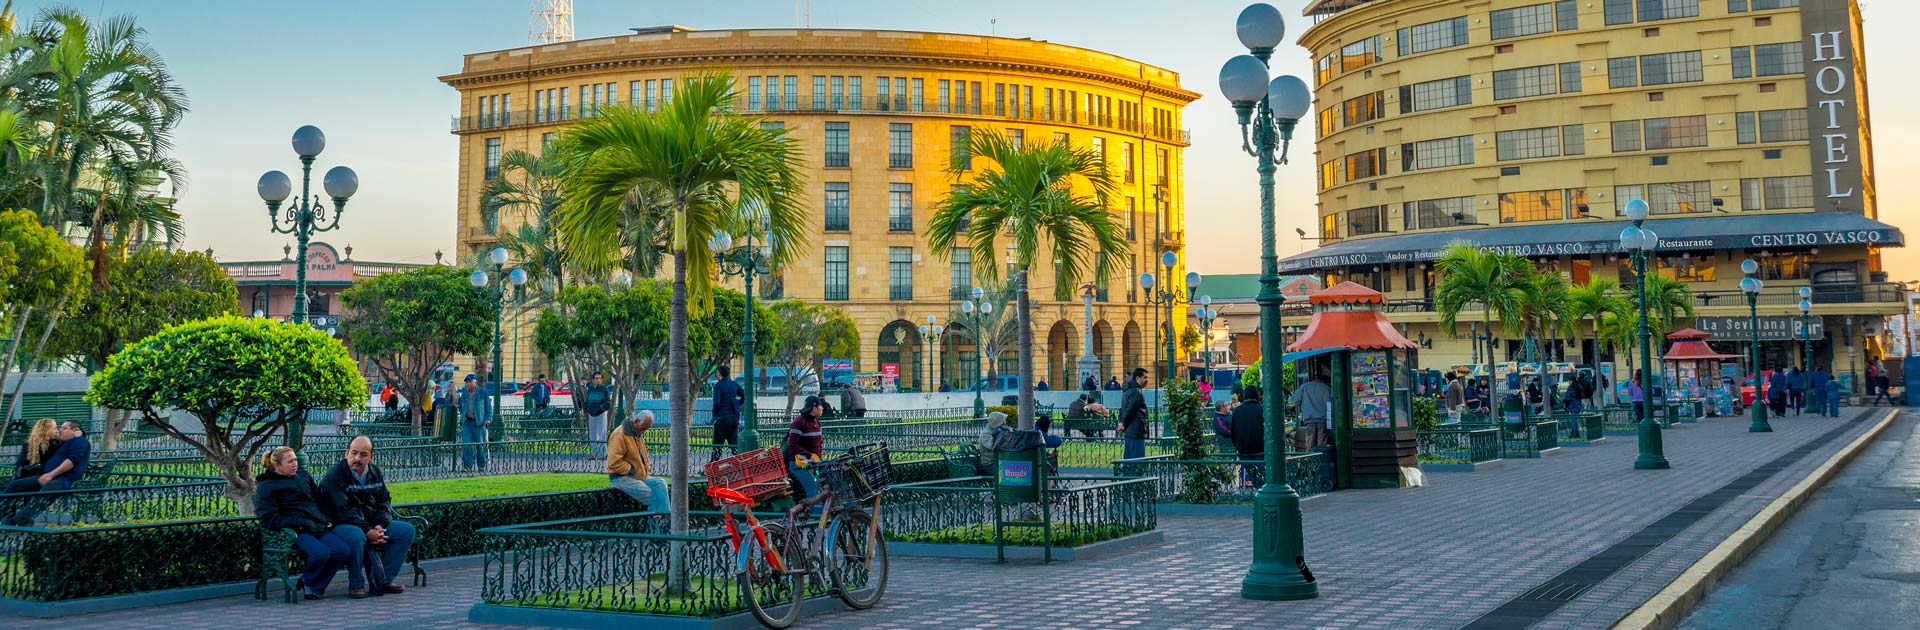 Vista del Centro Histórico de Tampico